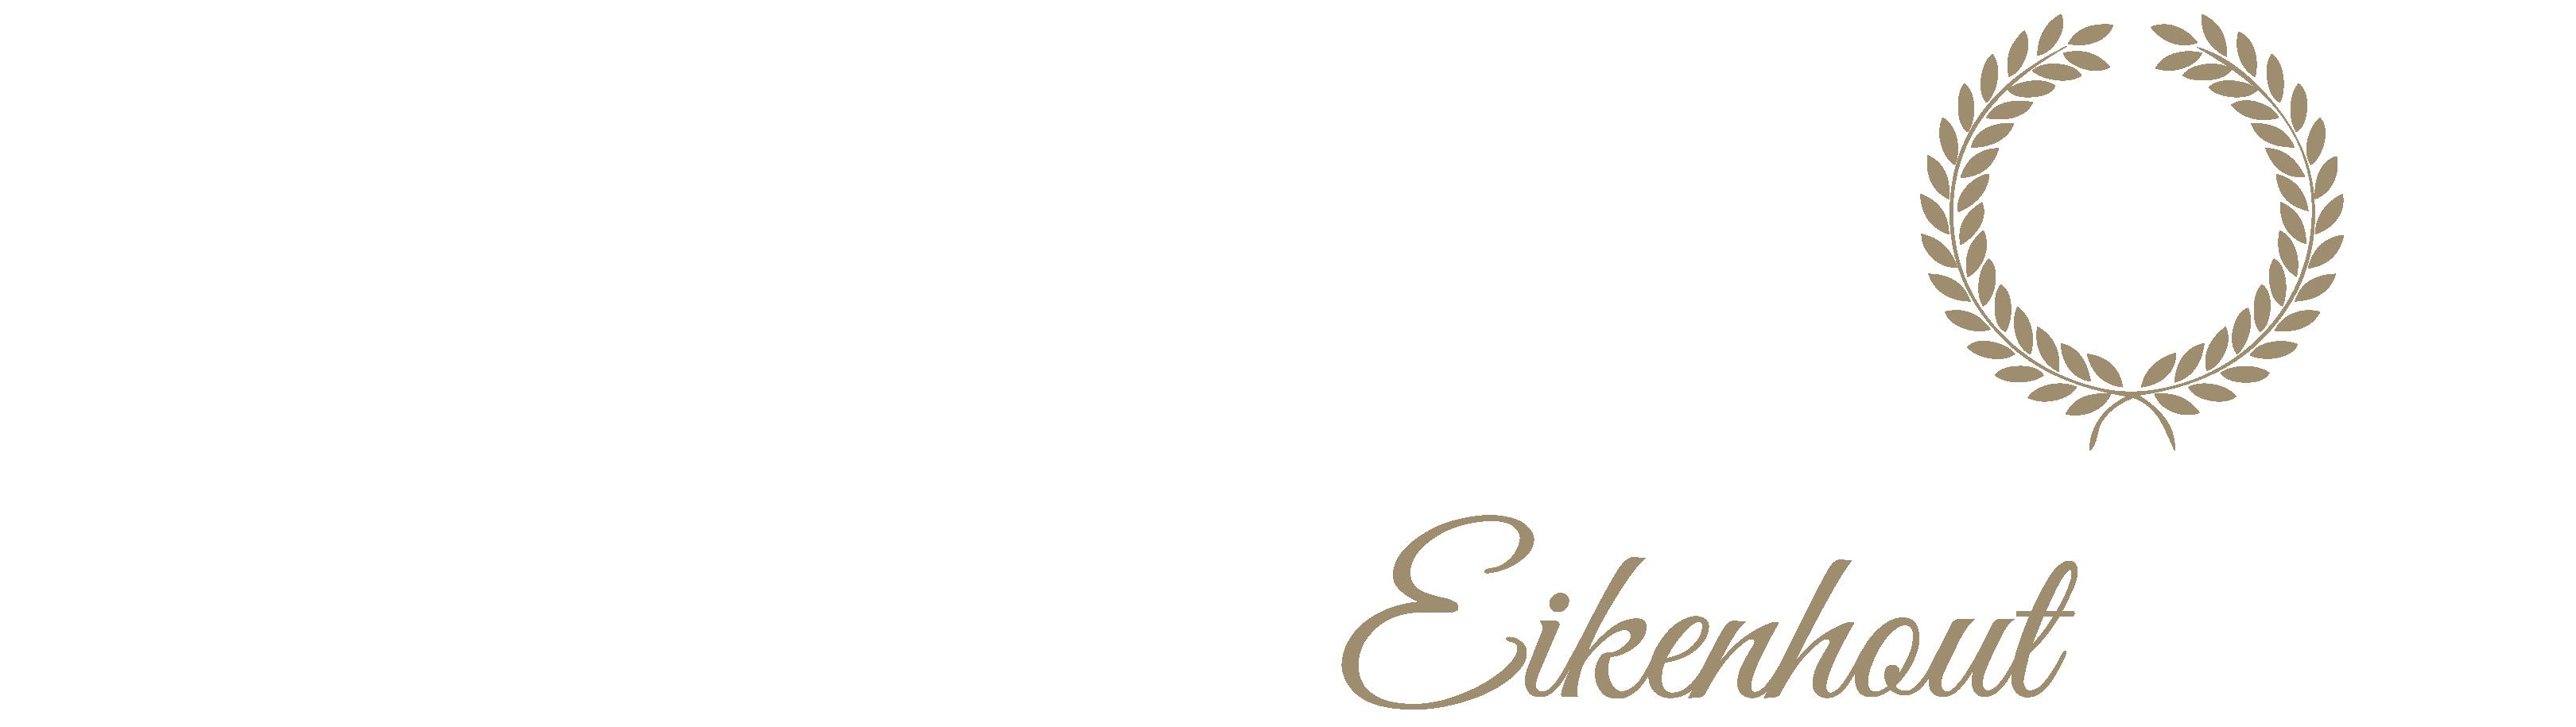 Waaijenberg-eikenhout